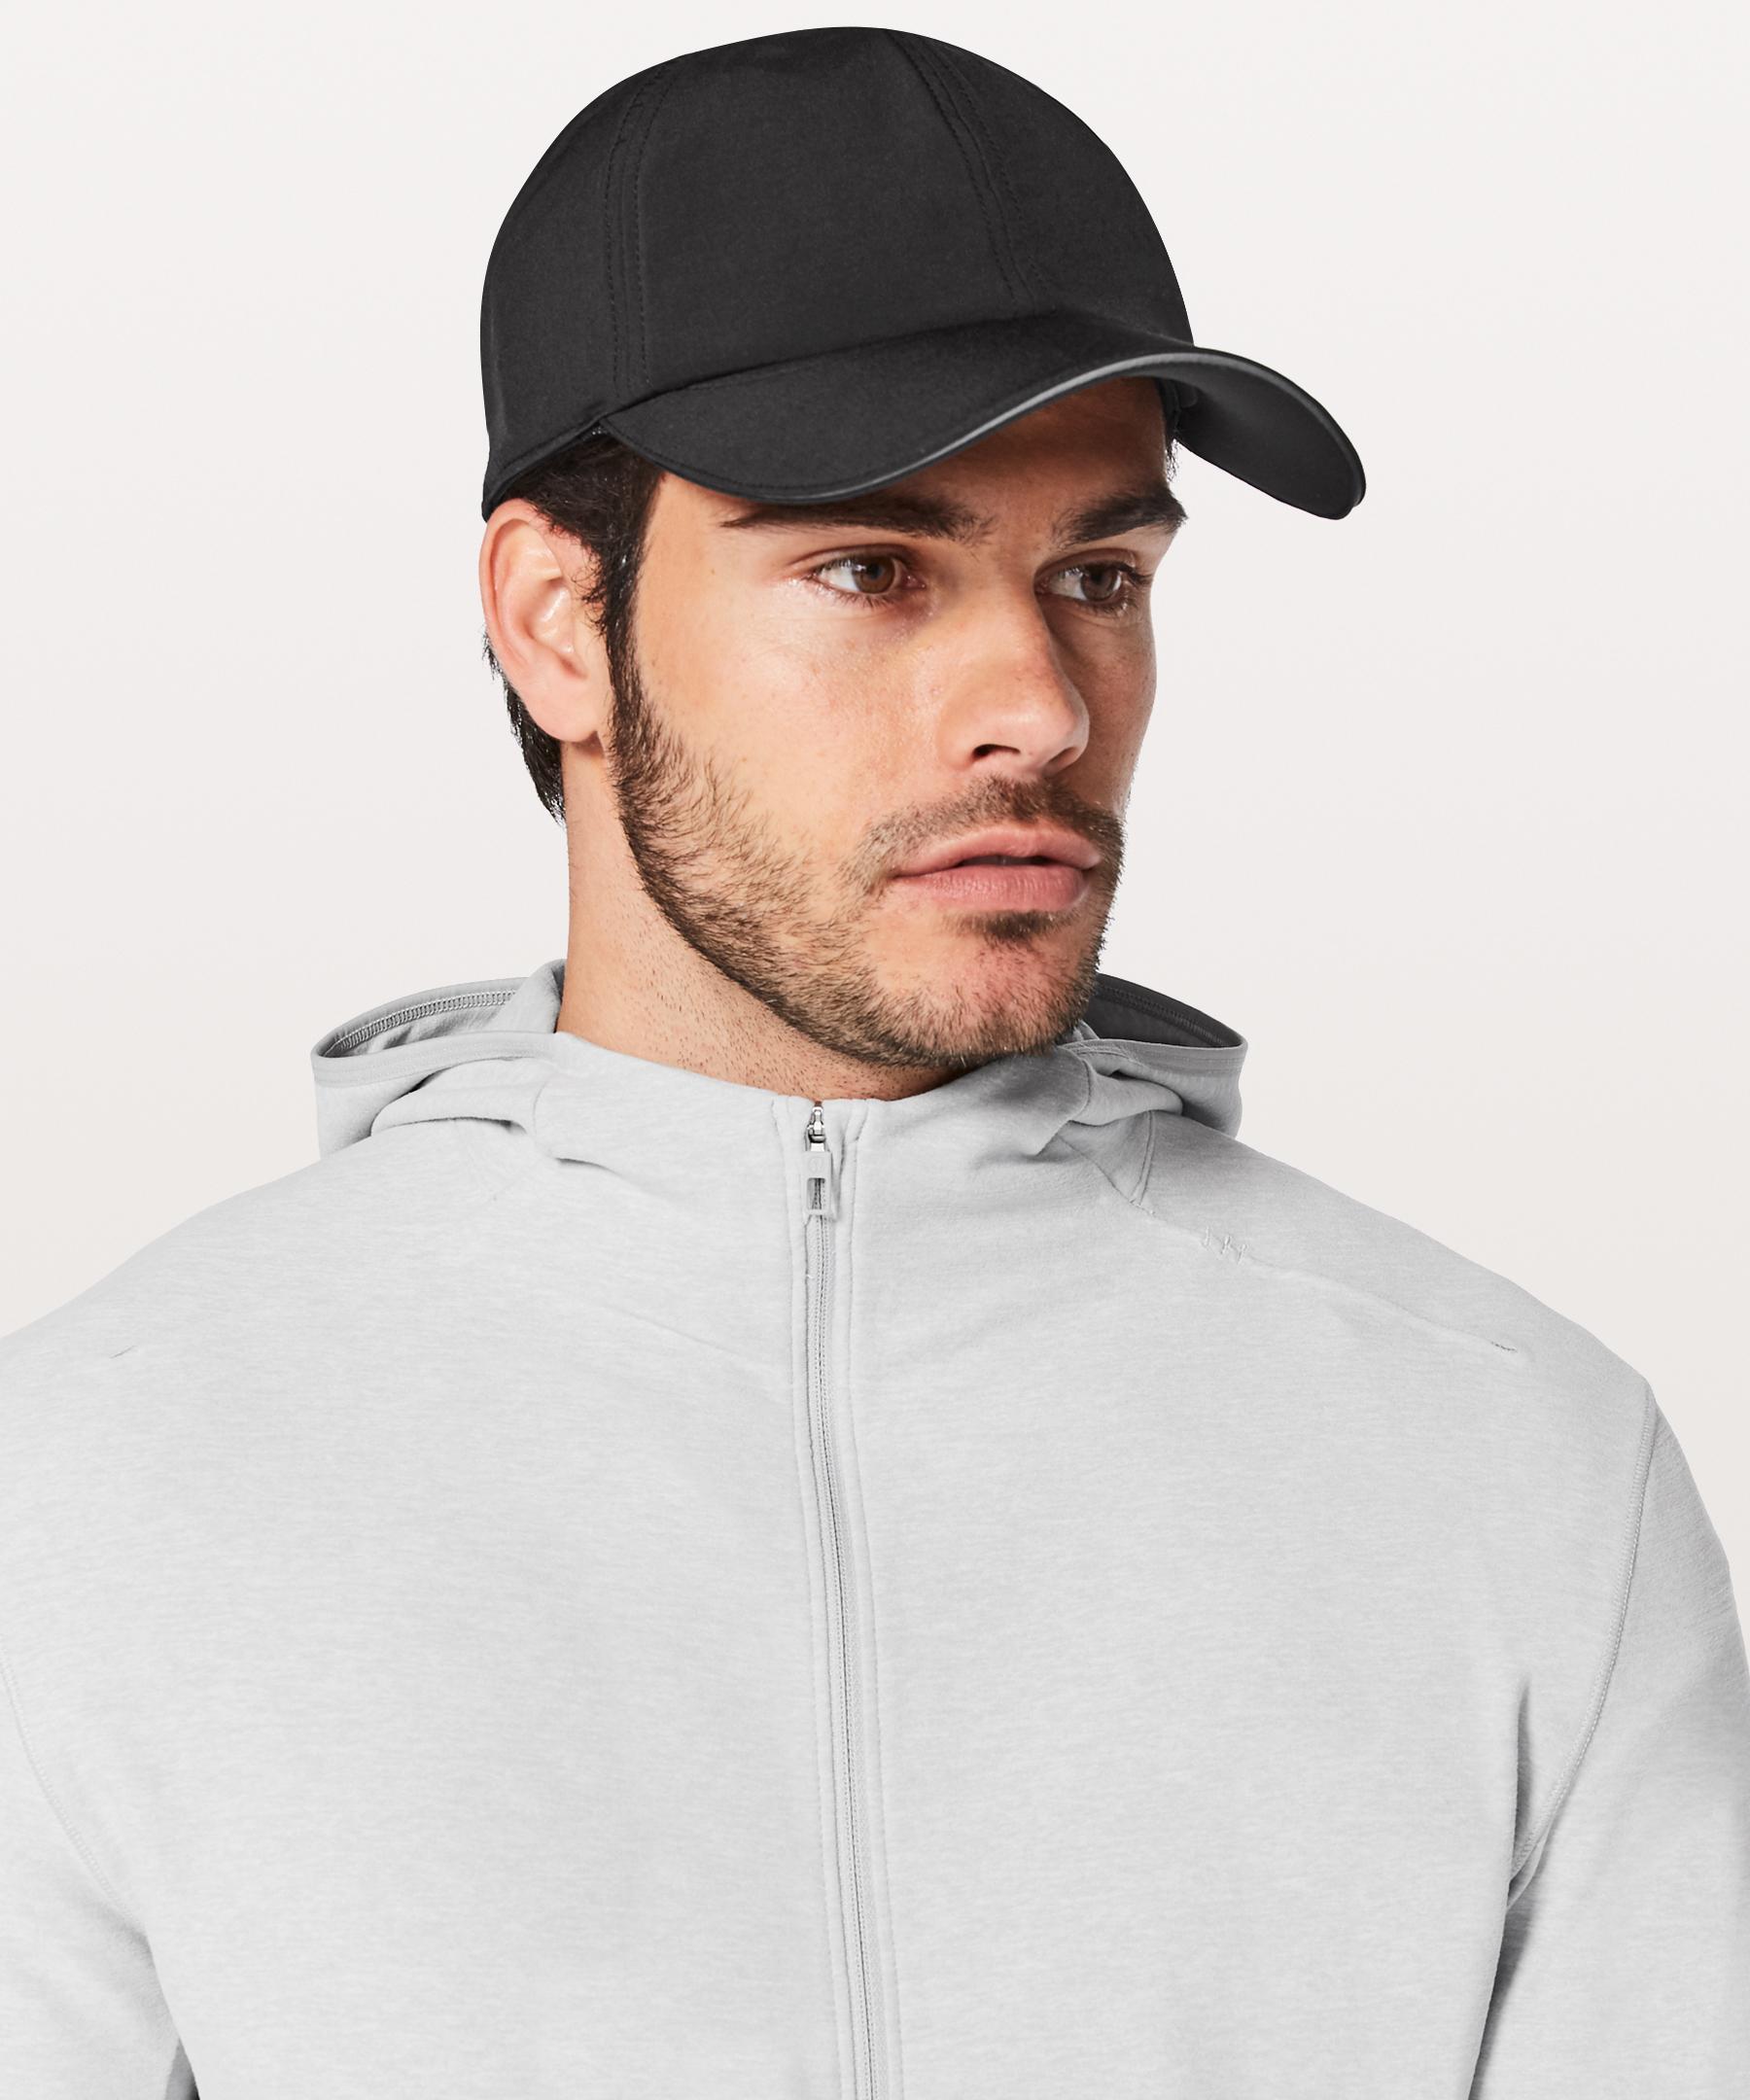 Lyst - lululemon athletica Lightspeed Run Hat in Black for Men b44f78dc479c